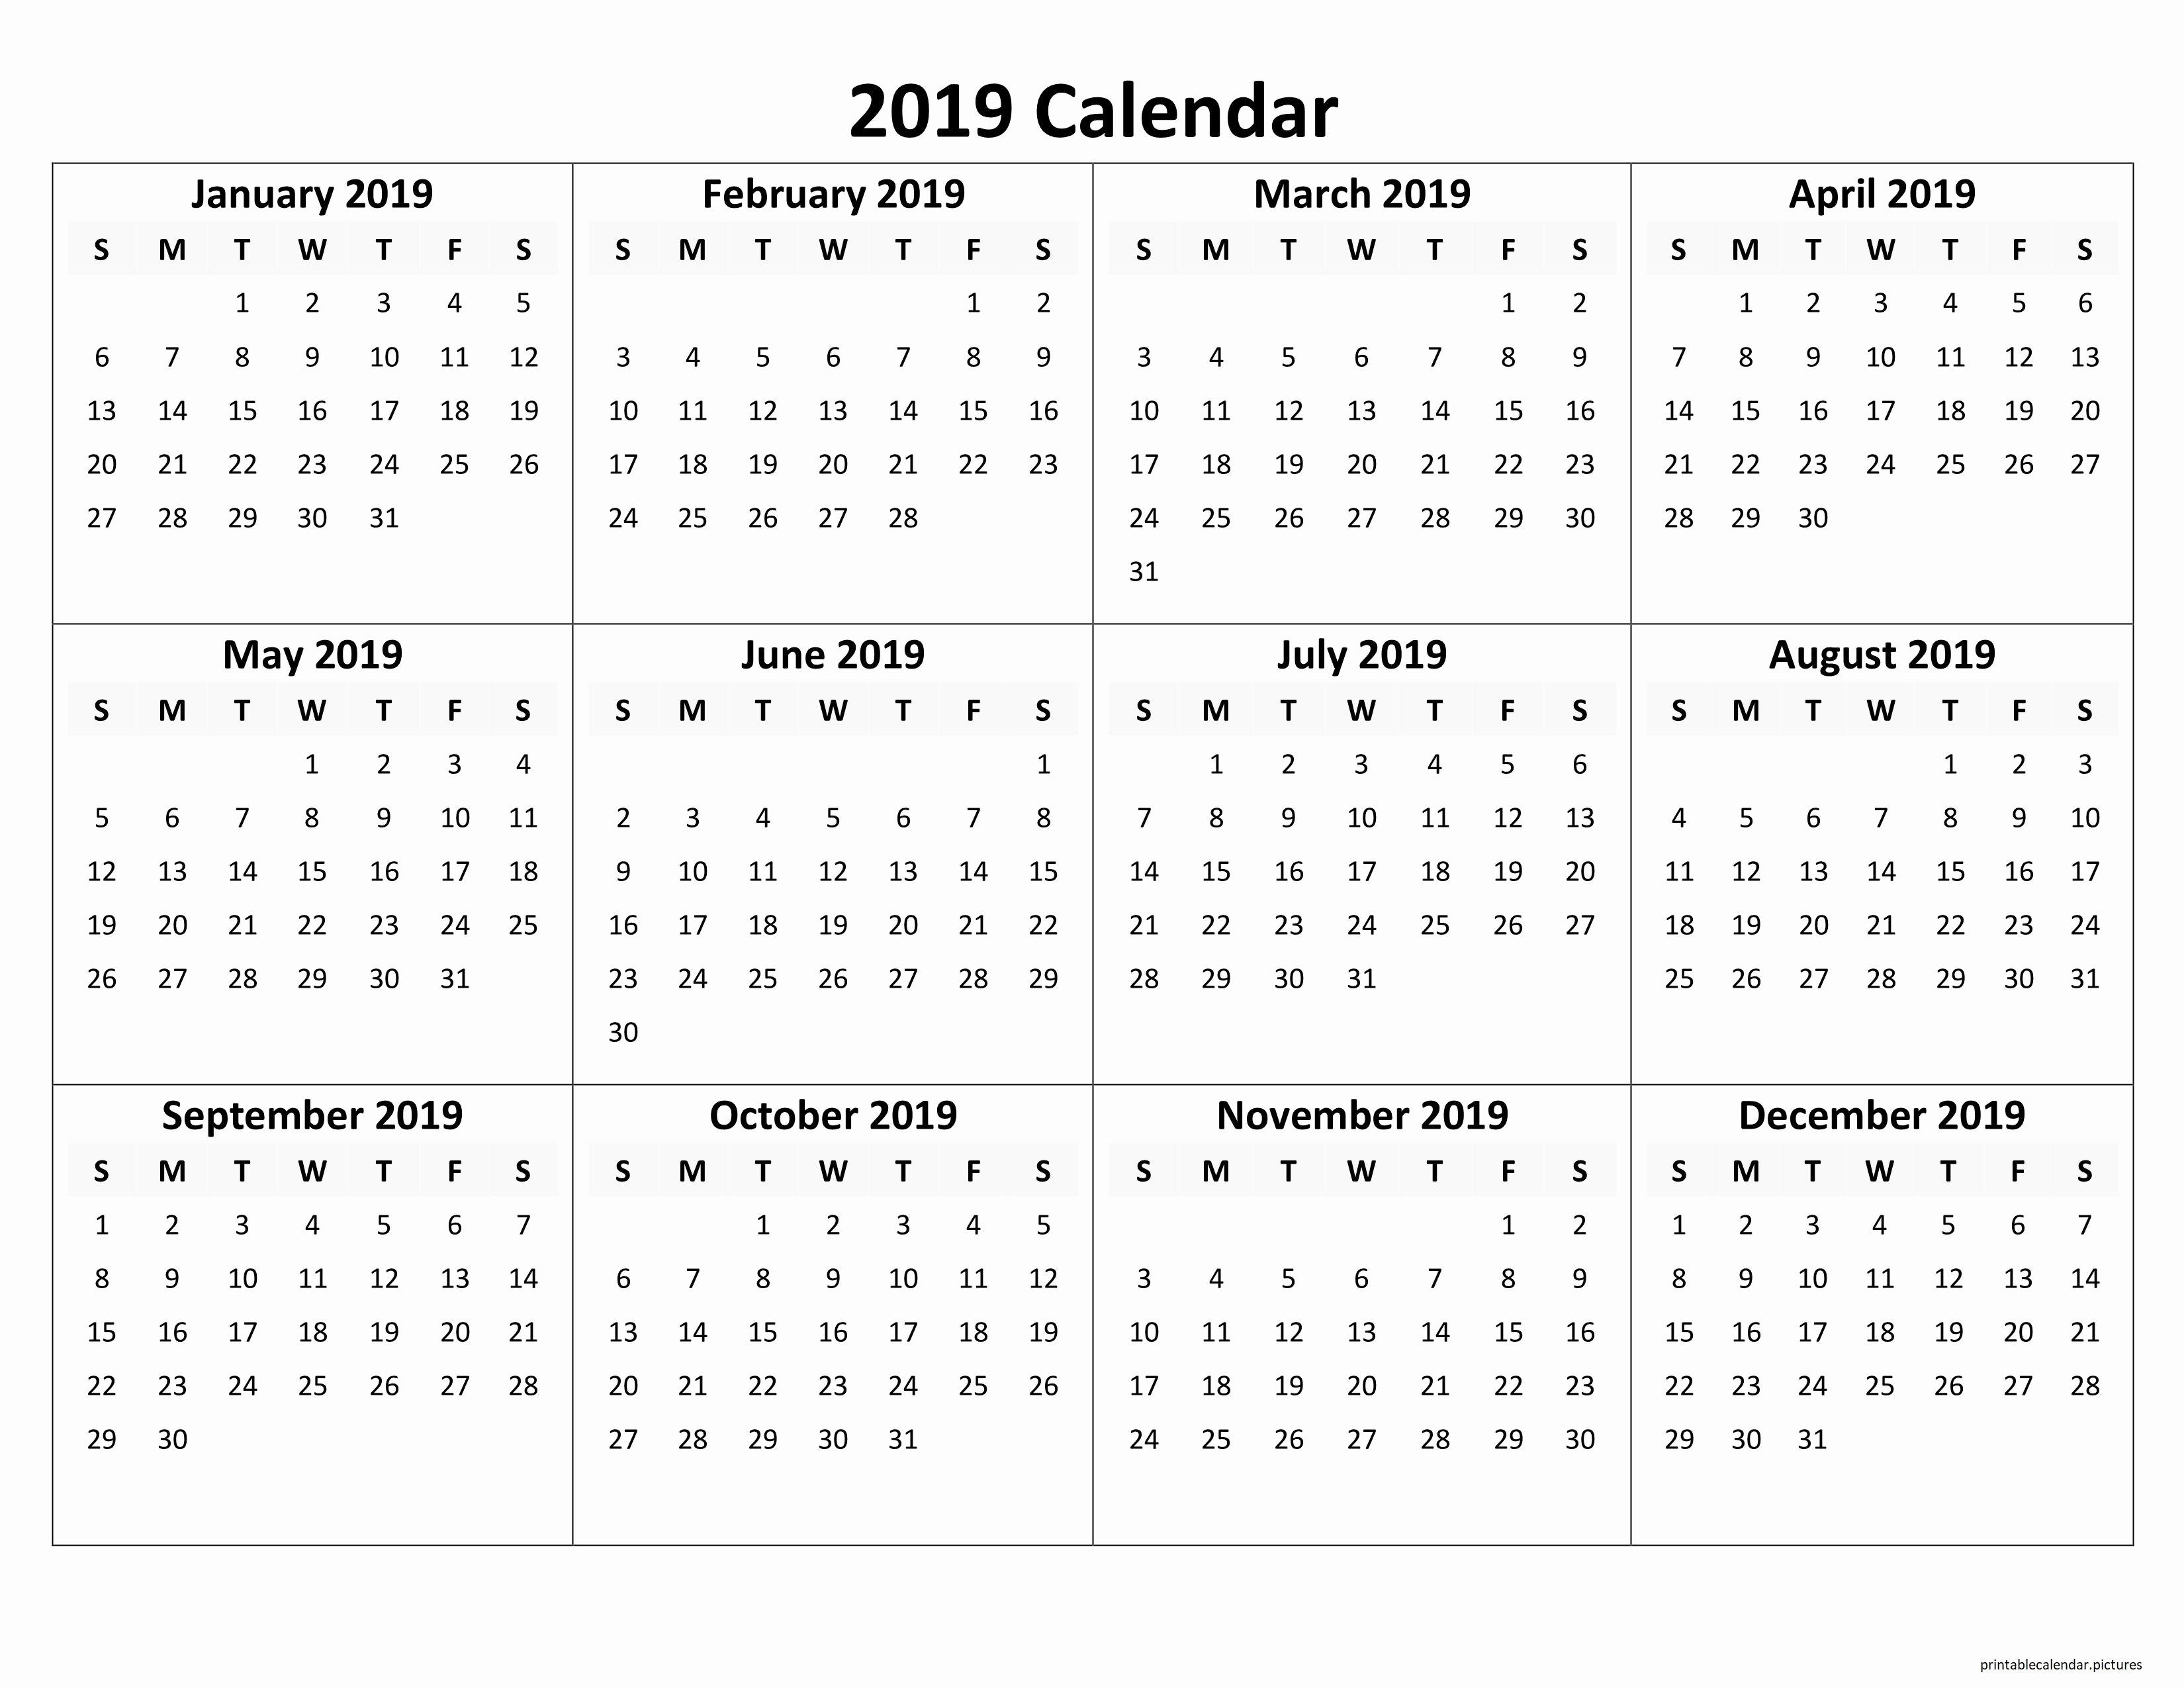 Free Printable Calendar Templates 2019 Unique Printable Yearly Calendar 2019